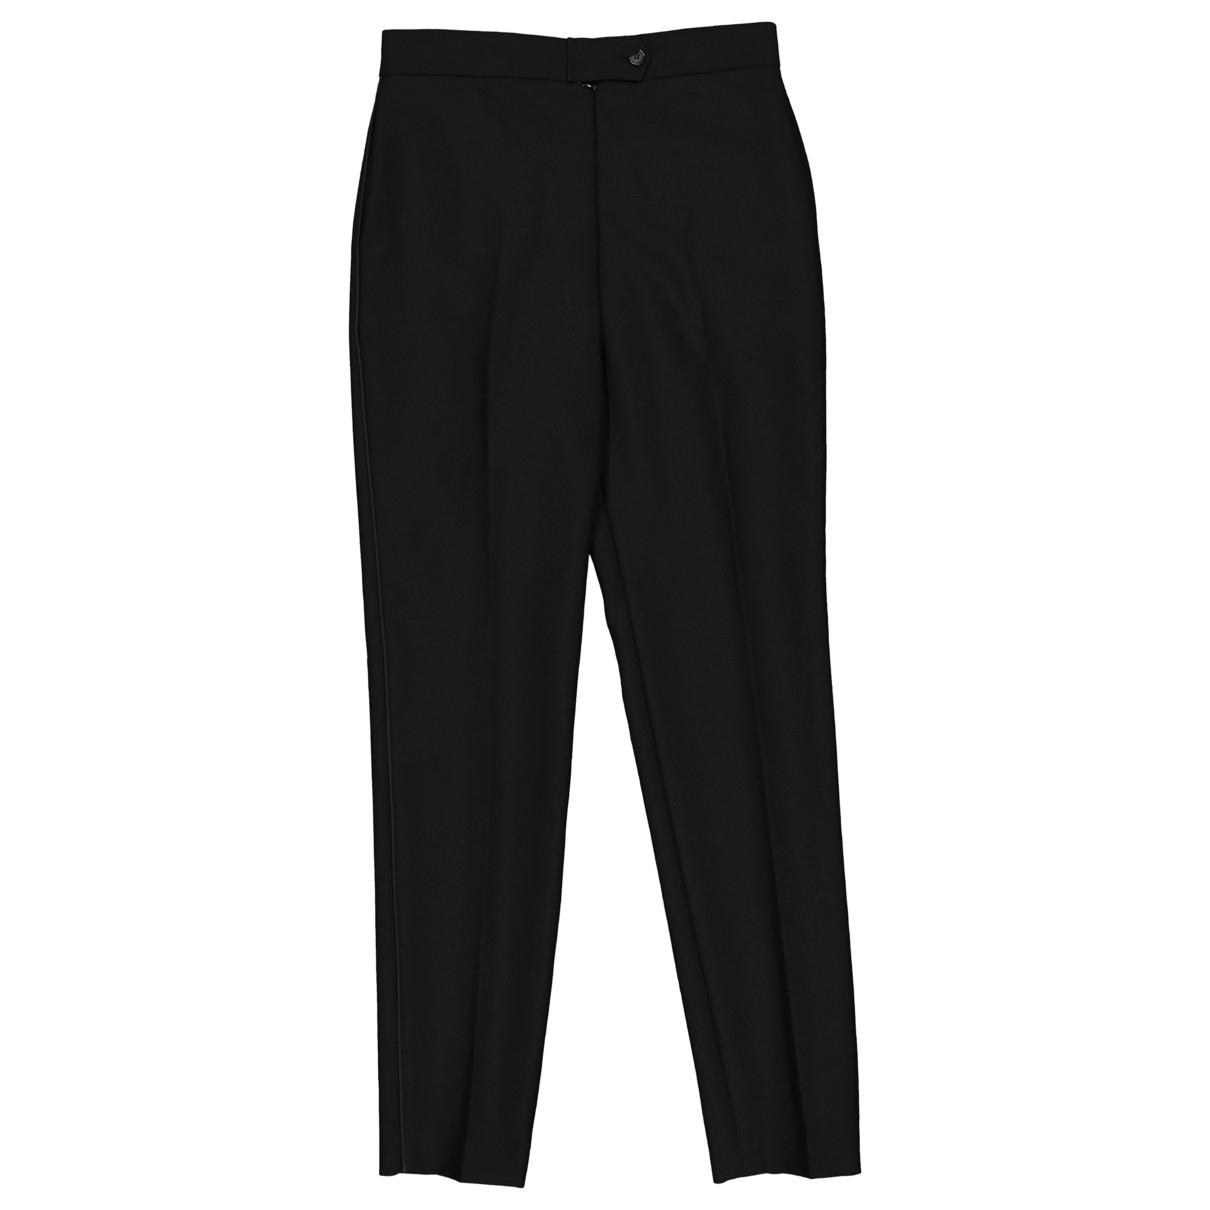 Balenciaga N Black Wool Trousers for Women 34 FR